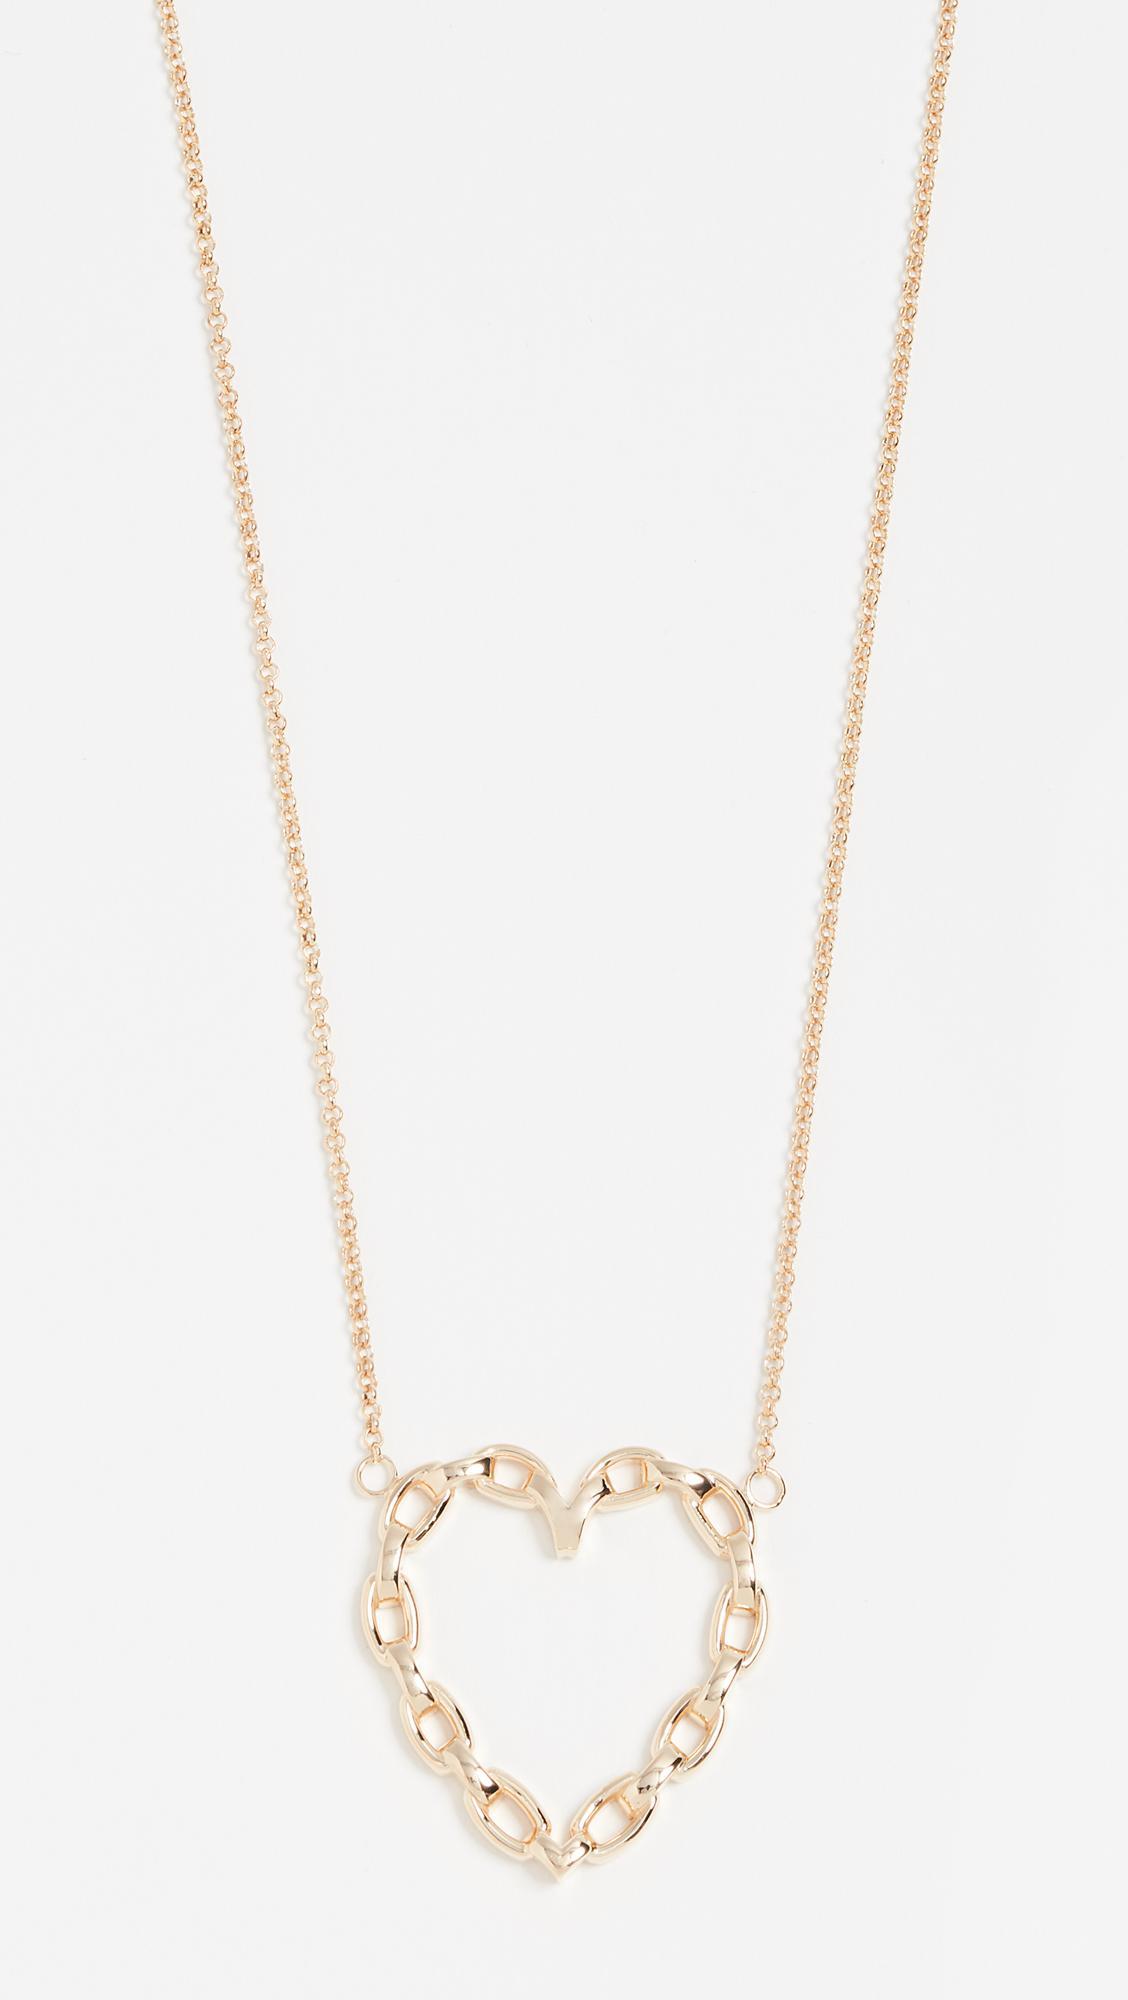 Jennifer Zeuner Margarita Chunky Chain Charm Necklace P3g5d